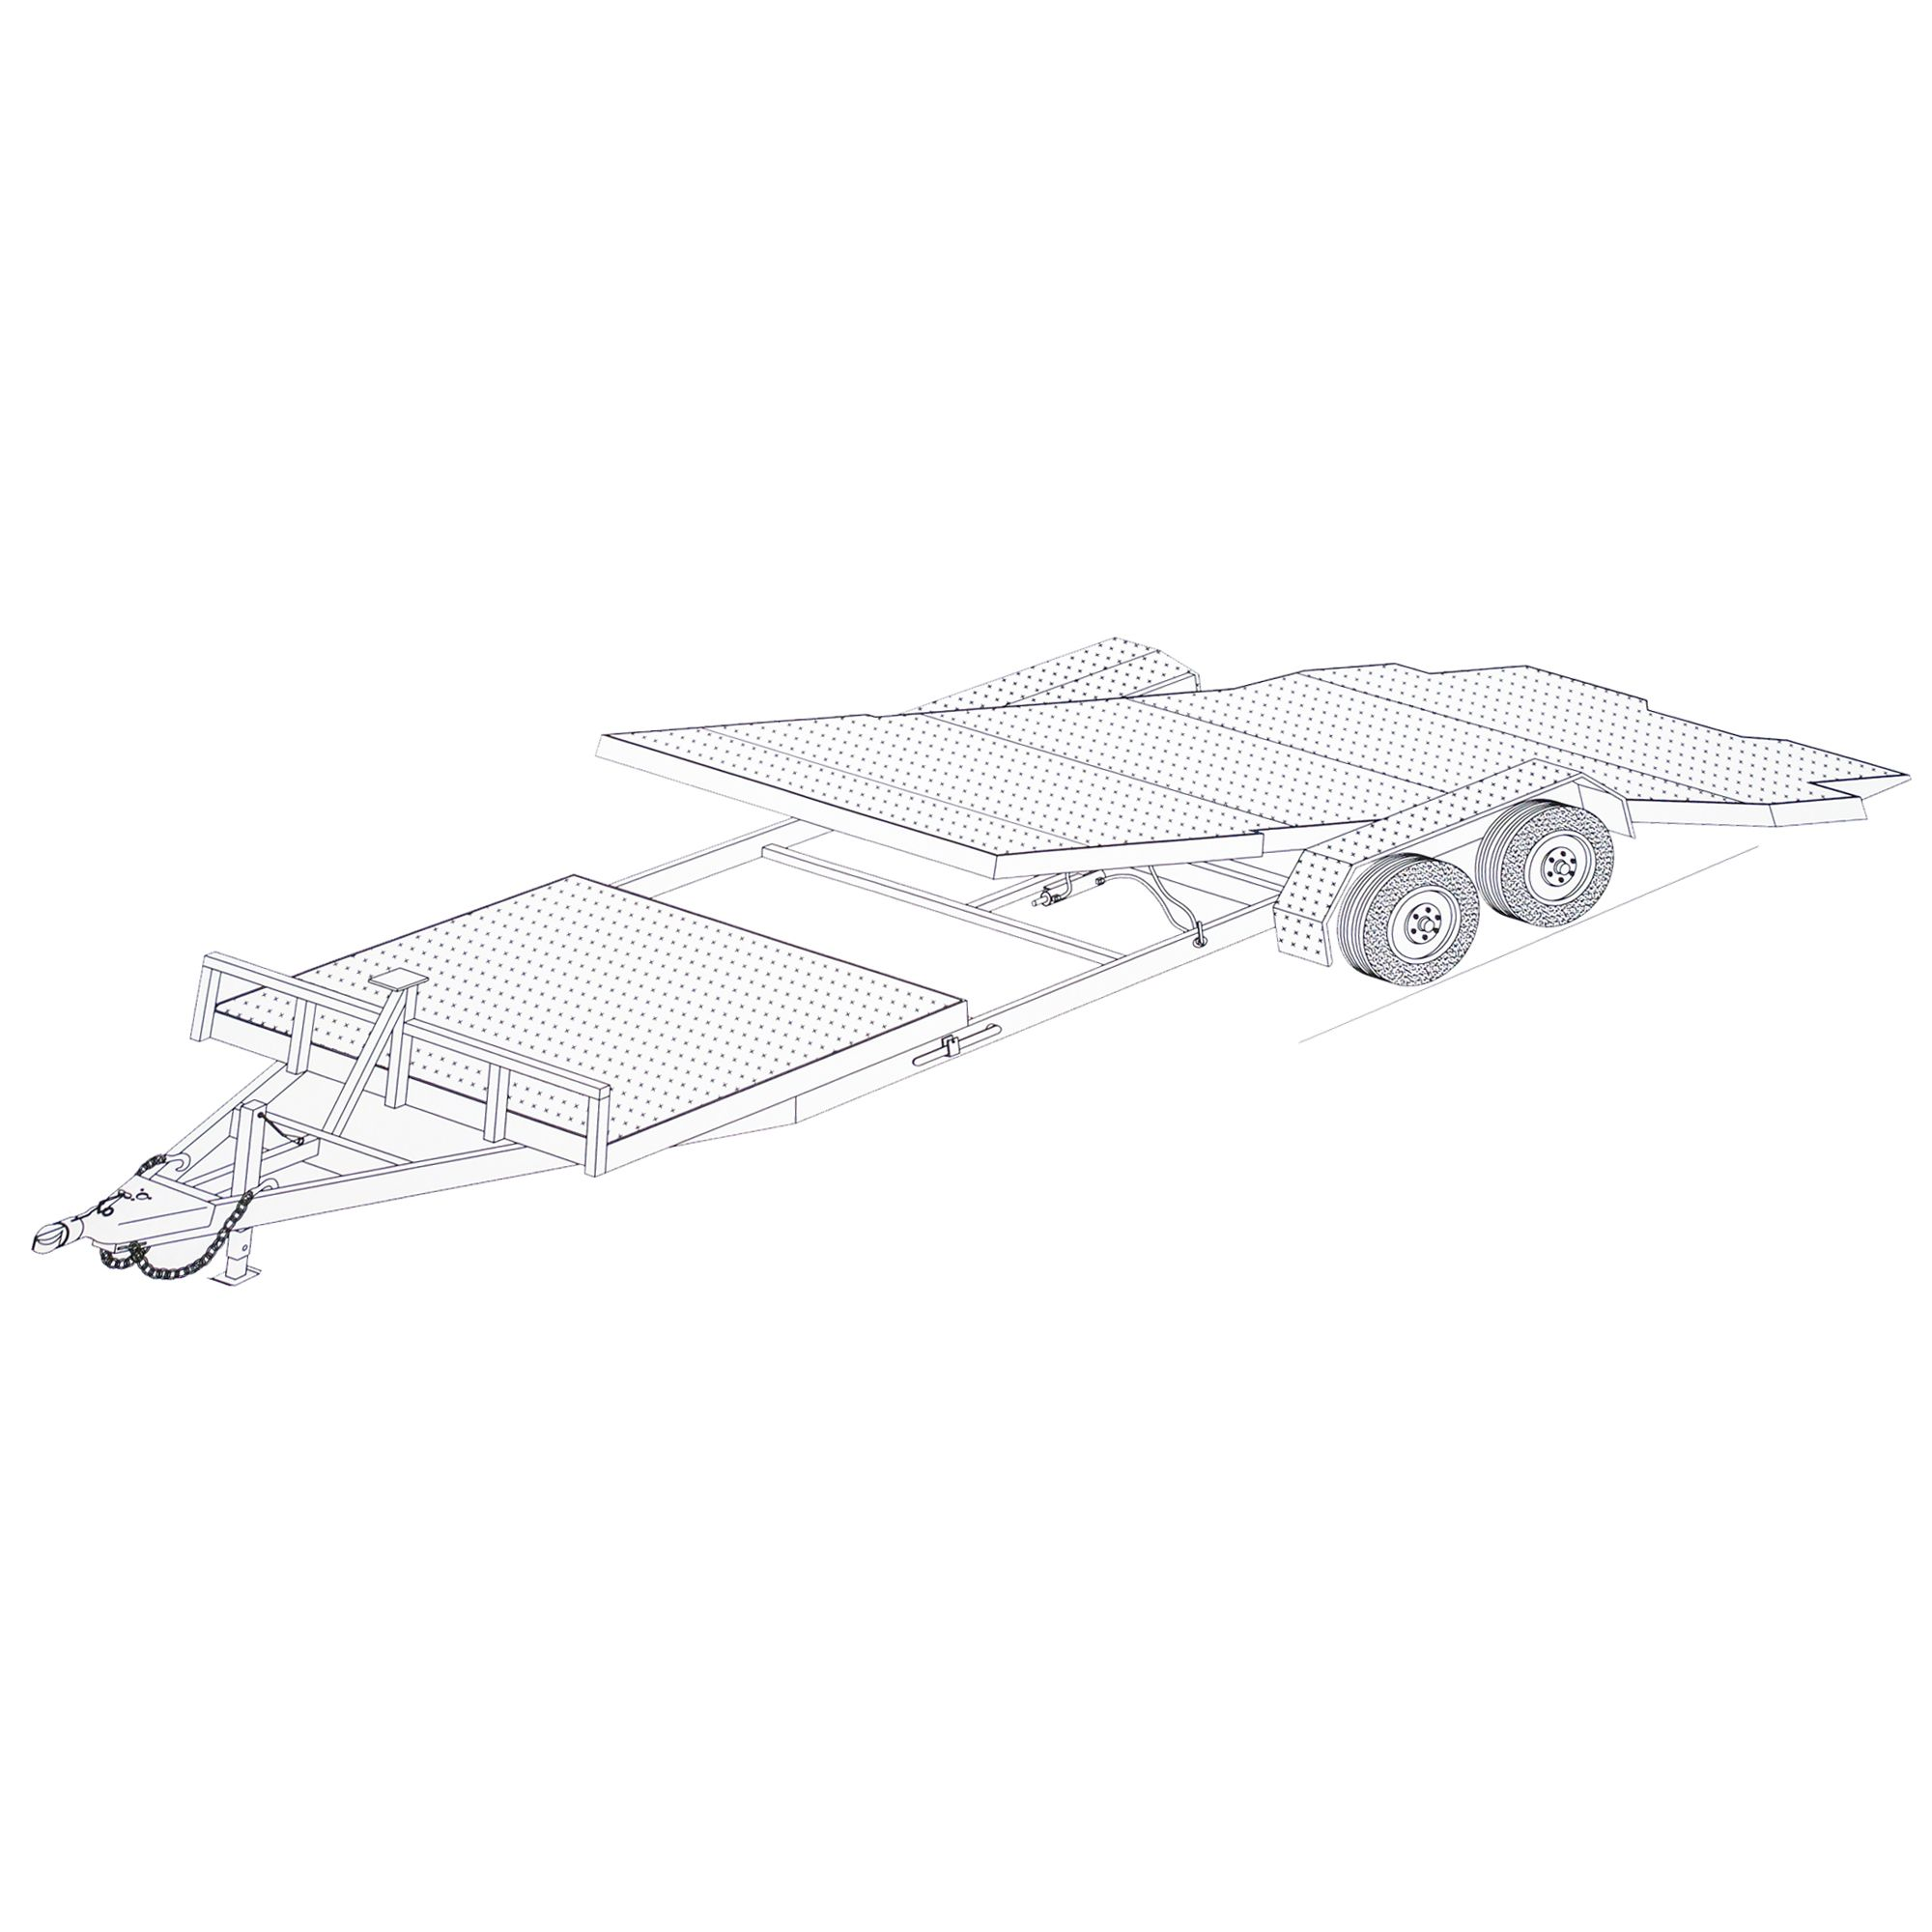 24′ Gravity Tilt Car Hauler Trailer Plans-Blueprints, Model 24GT – Johnson Trailer Parts